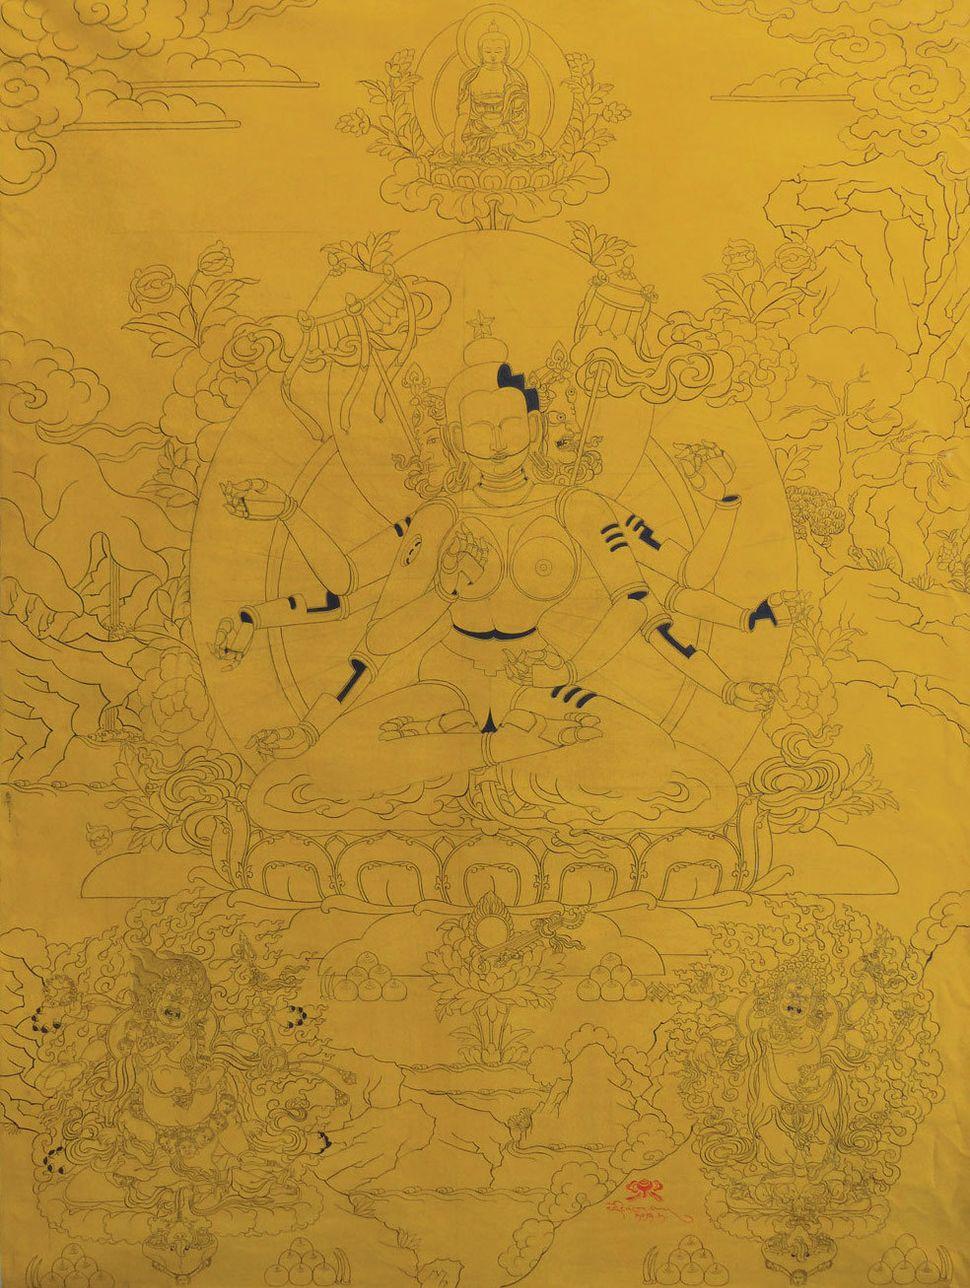 Jhamsang, Total Transformation of the Buddha